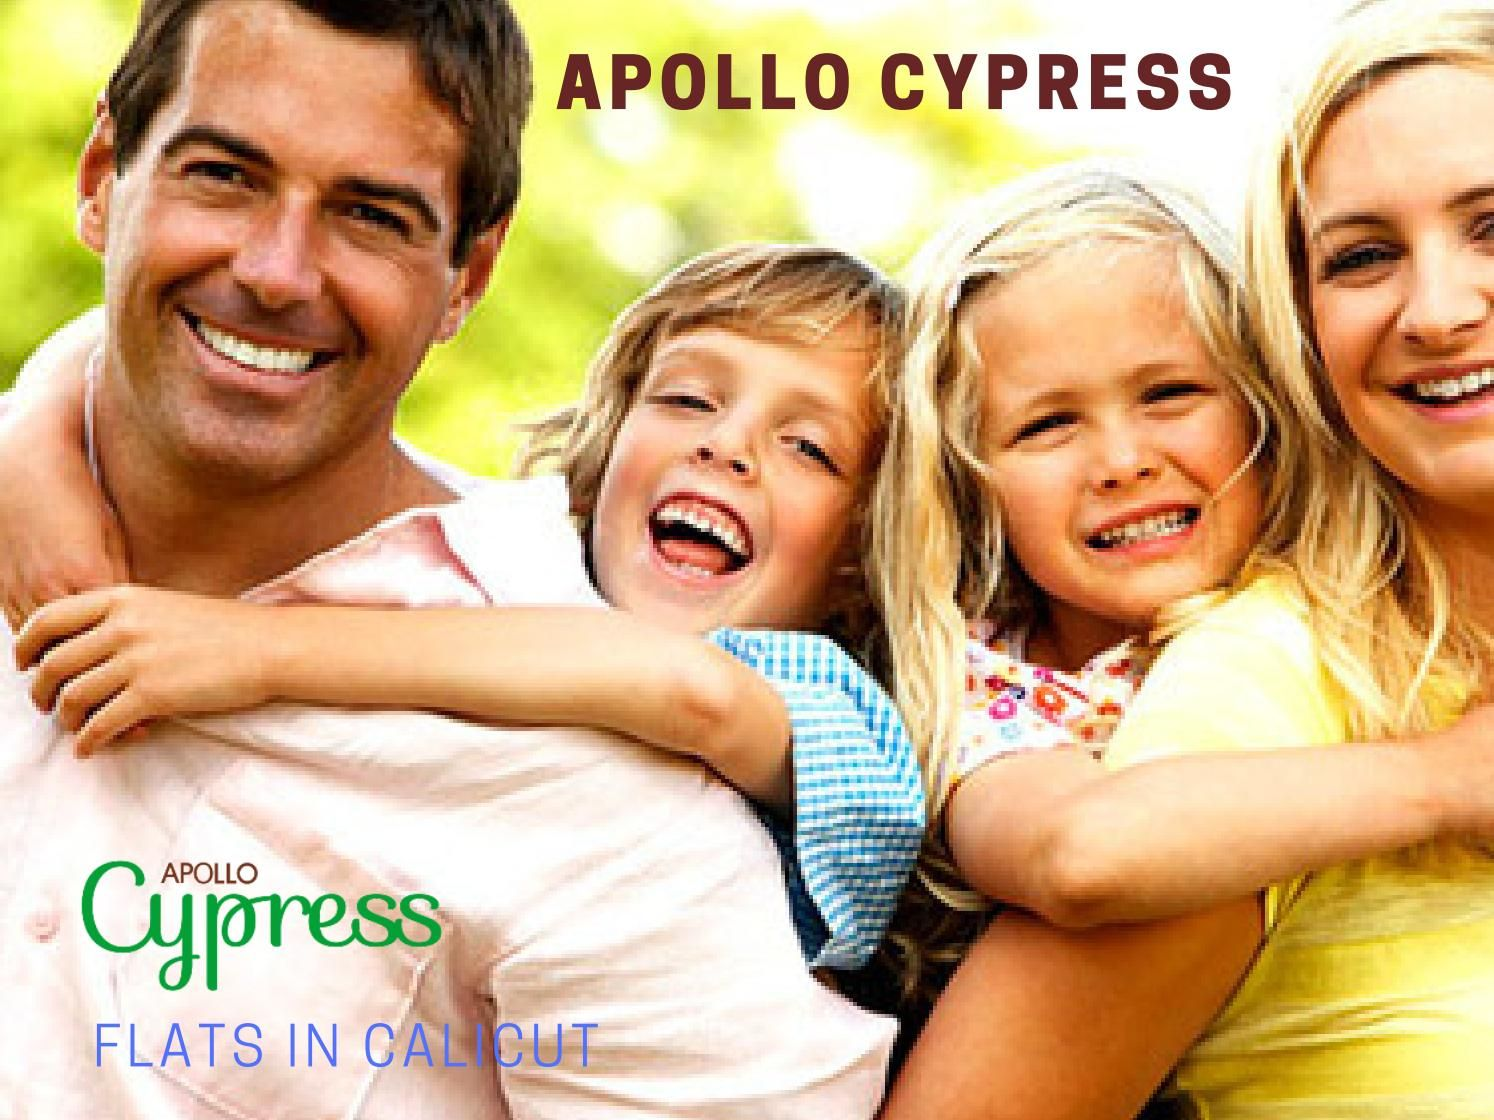 Flats In Calicut Apollo Cypress